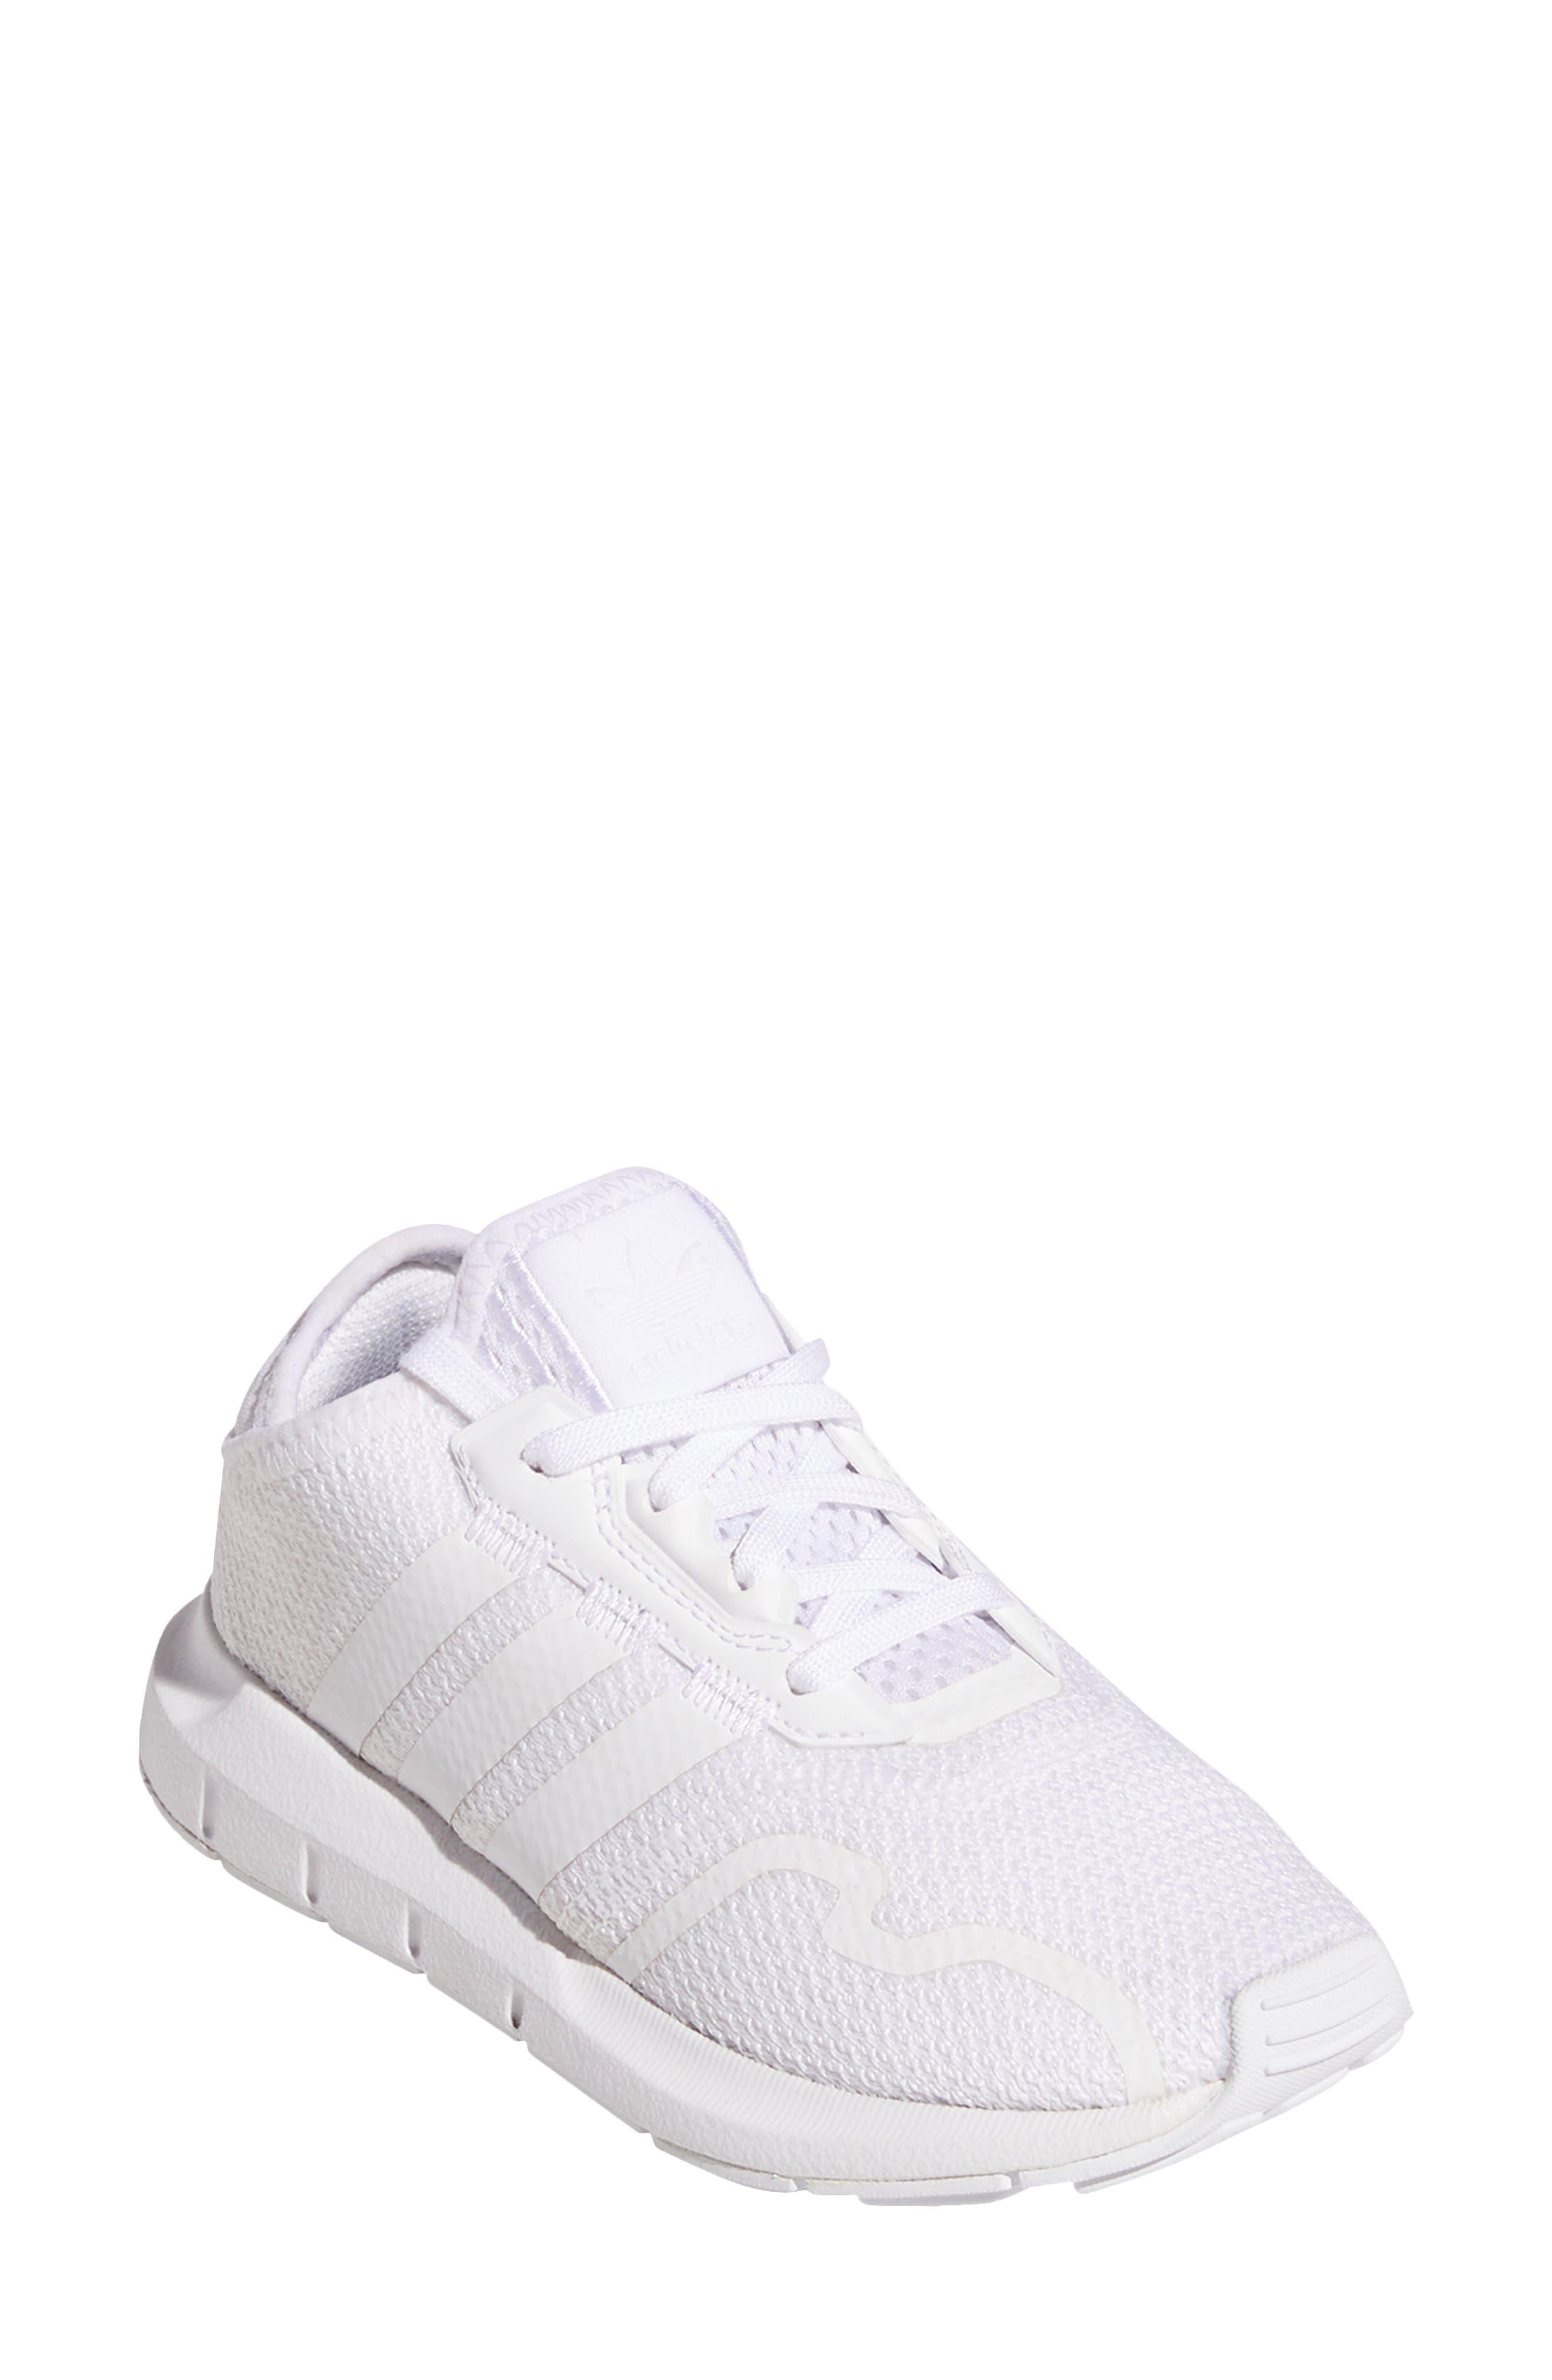 Adidas Swift Run X Sneaker (Toddler & Little Kid)   Nordstrom